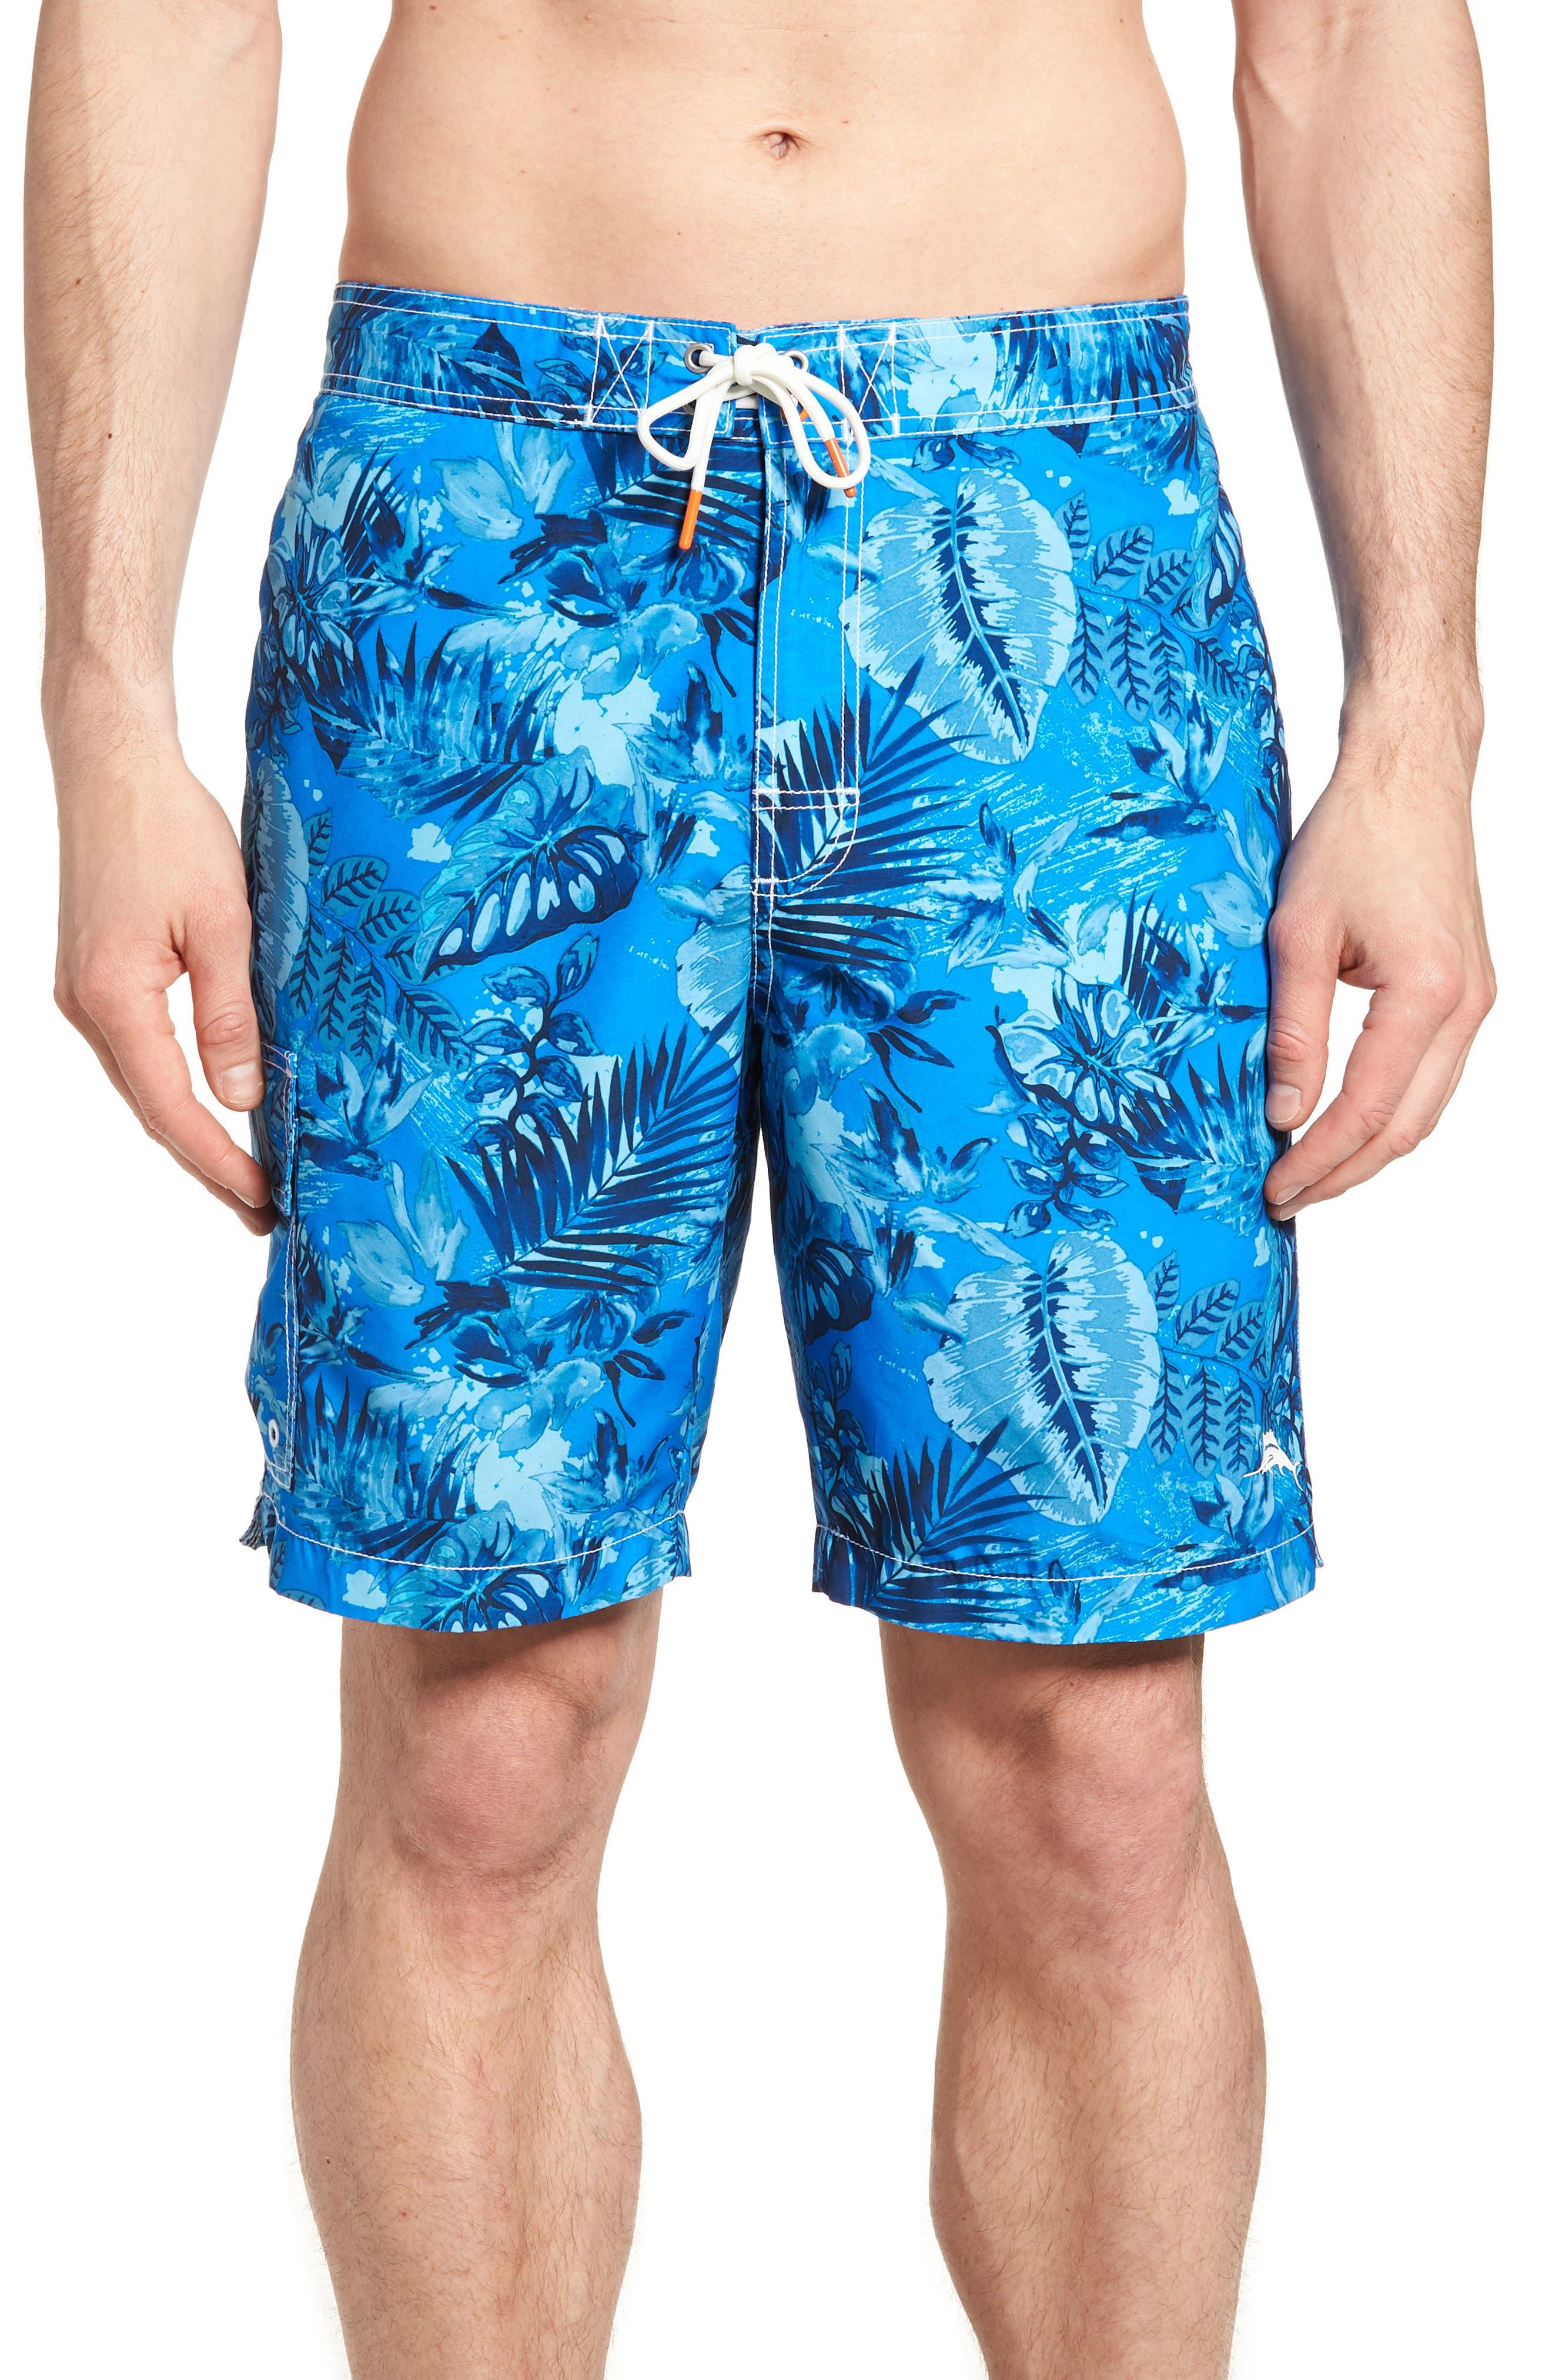 TOMMY BAHAMA Baja Selva Shores Board Shorts, Main, color, 400